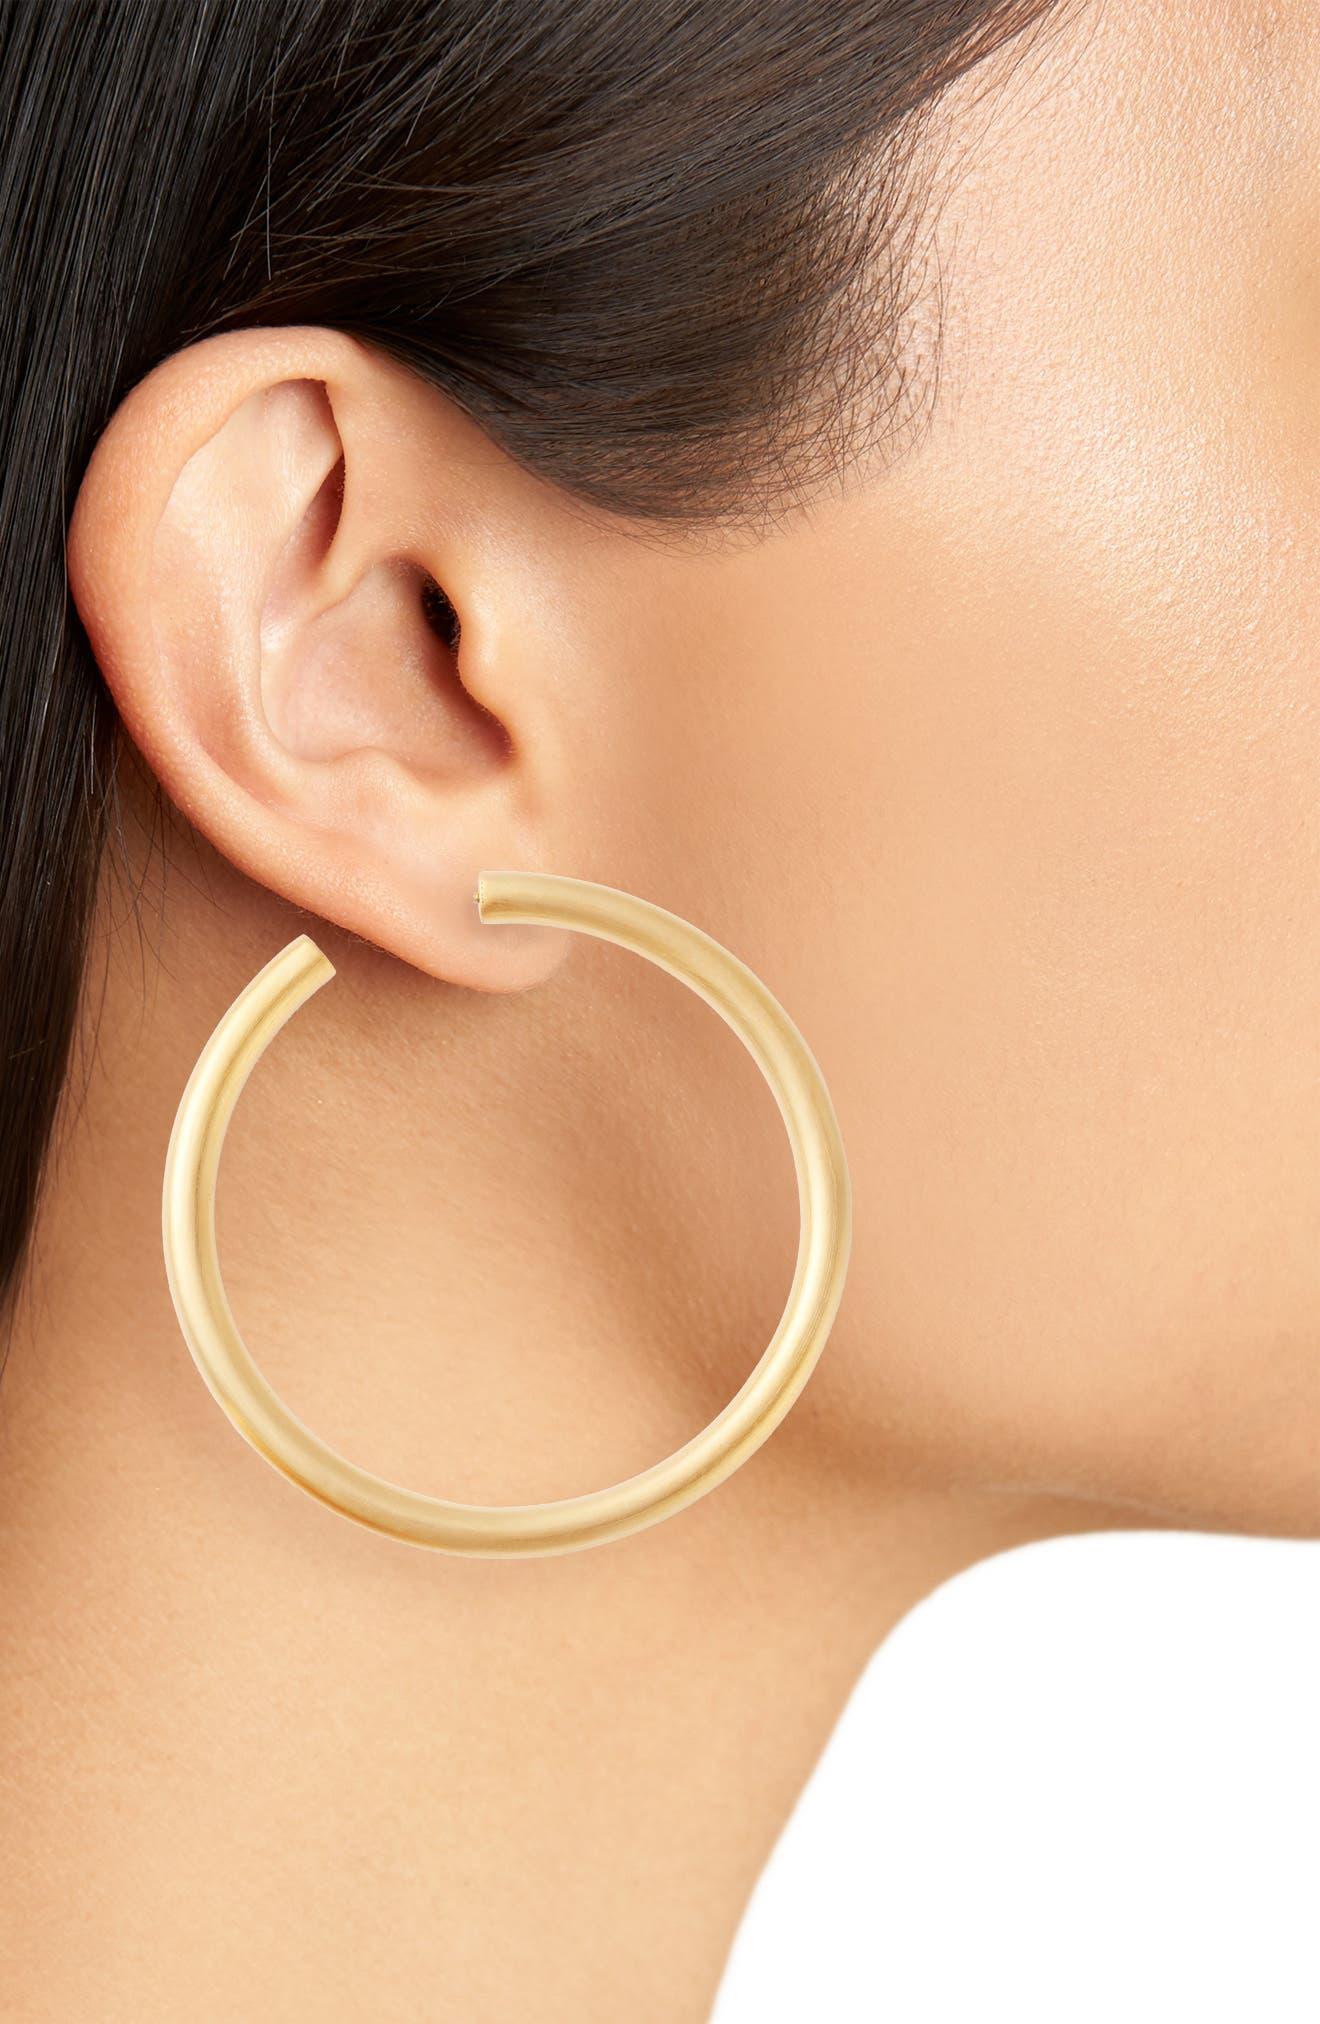 Ipanema Hoop Earrings,                             Alternate thumbnail 2, color,                             Gold